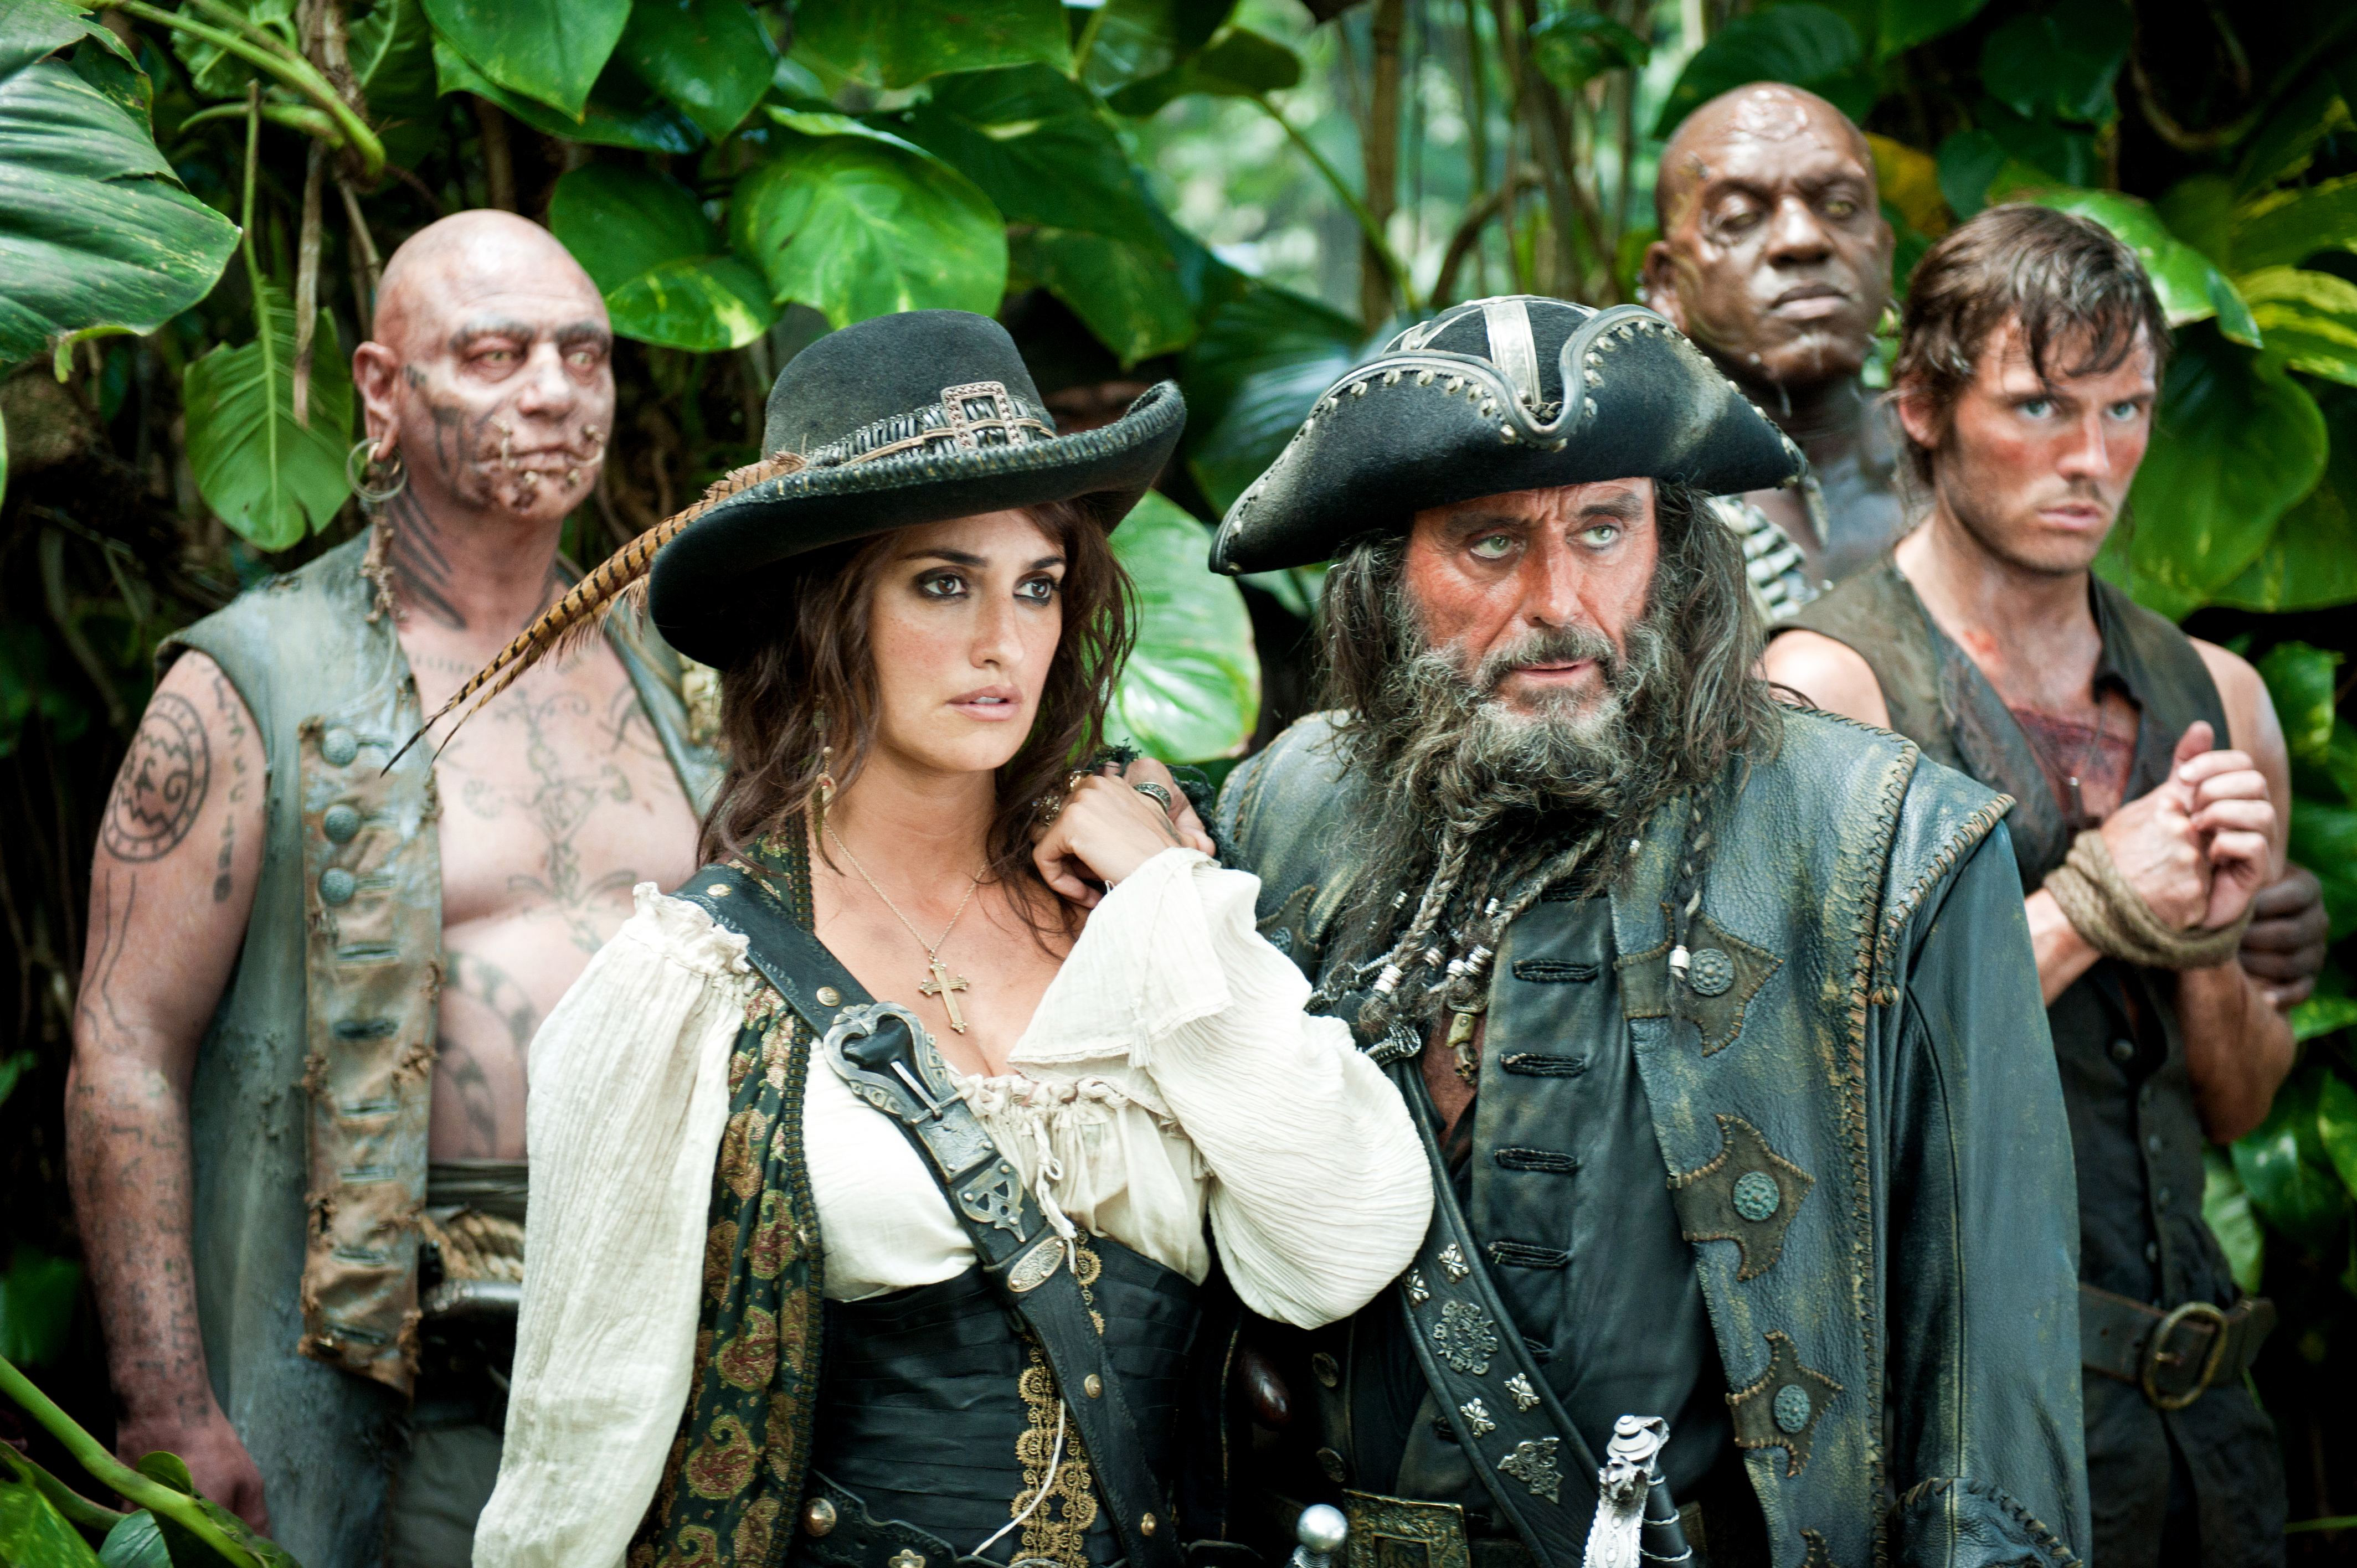 Blackbeard Wallpaper Hd - Pirates Of The Caribbean On Stranger Tides , HD Wallpaper & Backgrounds